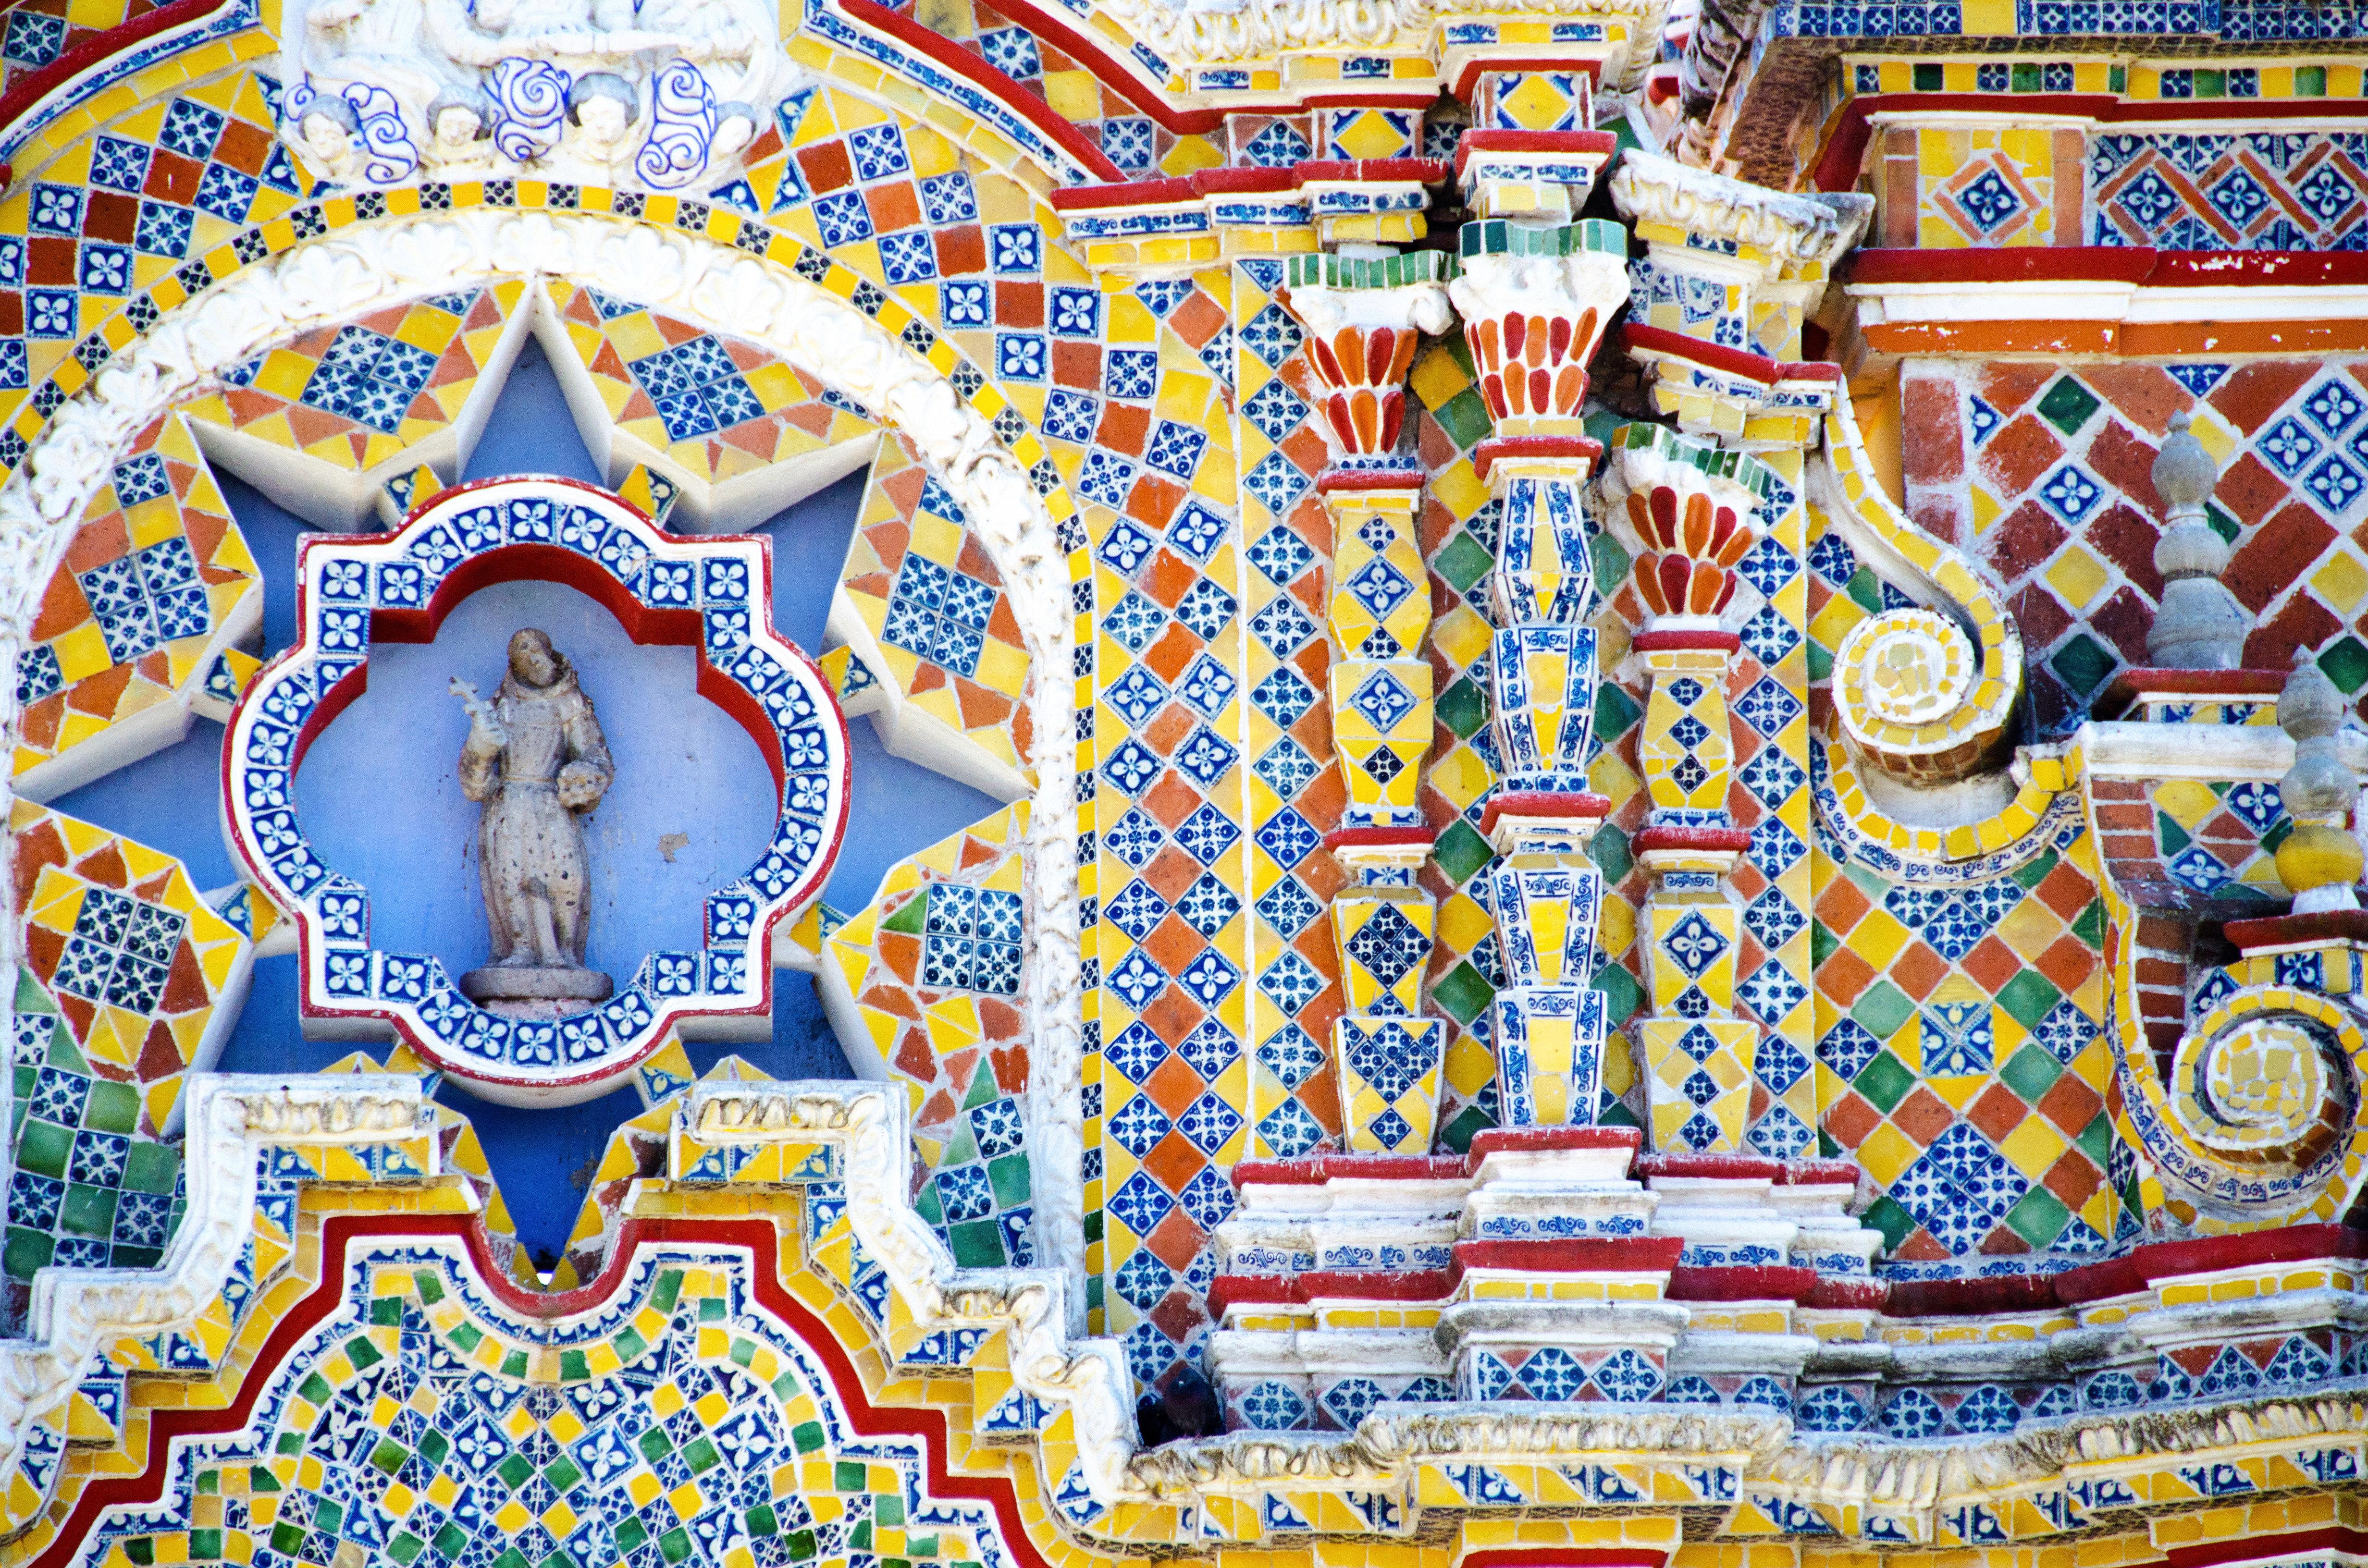 Architecture Cultural Historic Resort hindu temple colorful temple art mural place of worship amusement park amusement ride colored